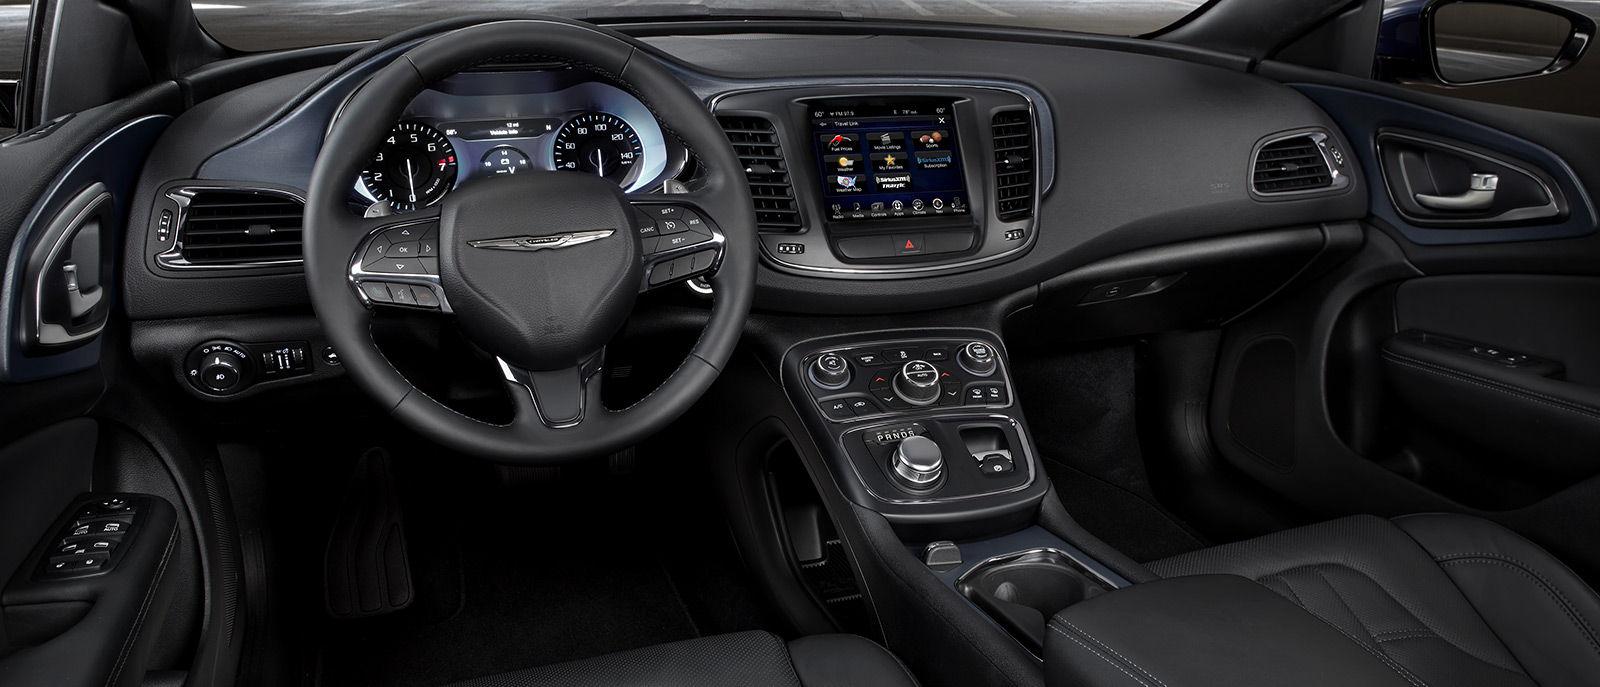 2016 Chrysler 200 | Ron Sayer's Chrysler | Idaho Falls, ID on